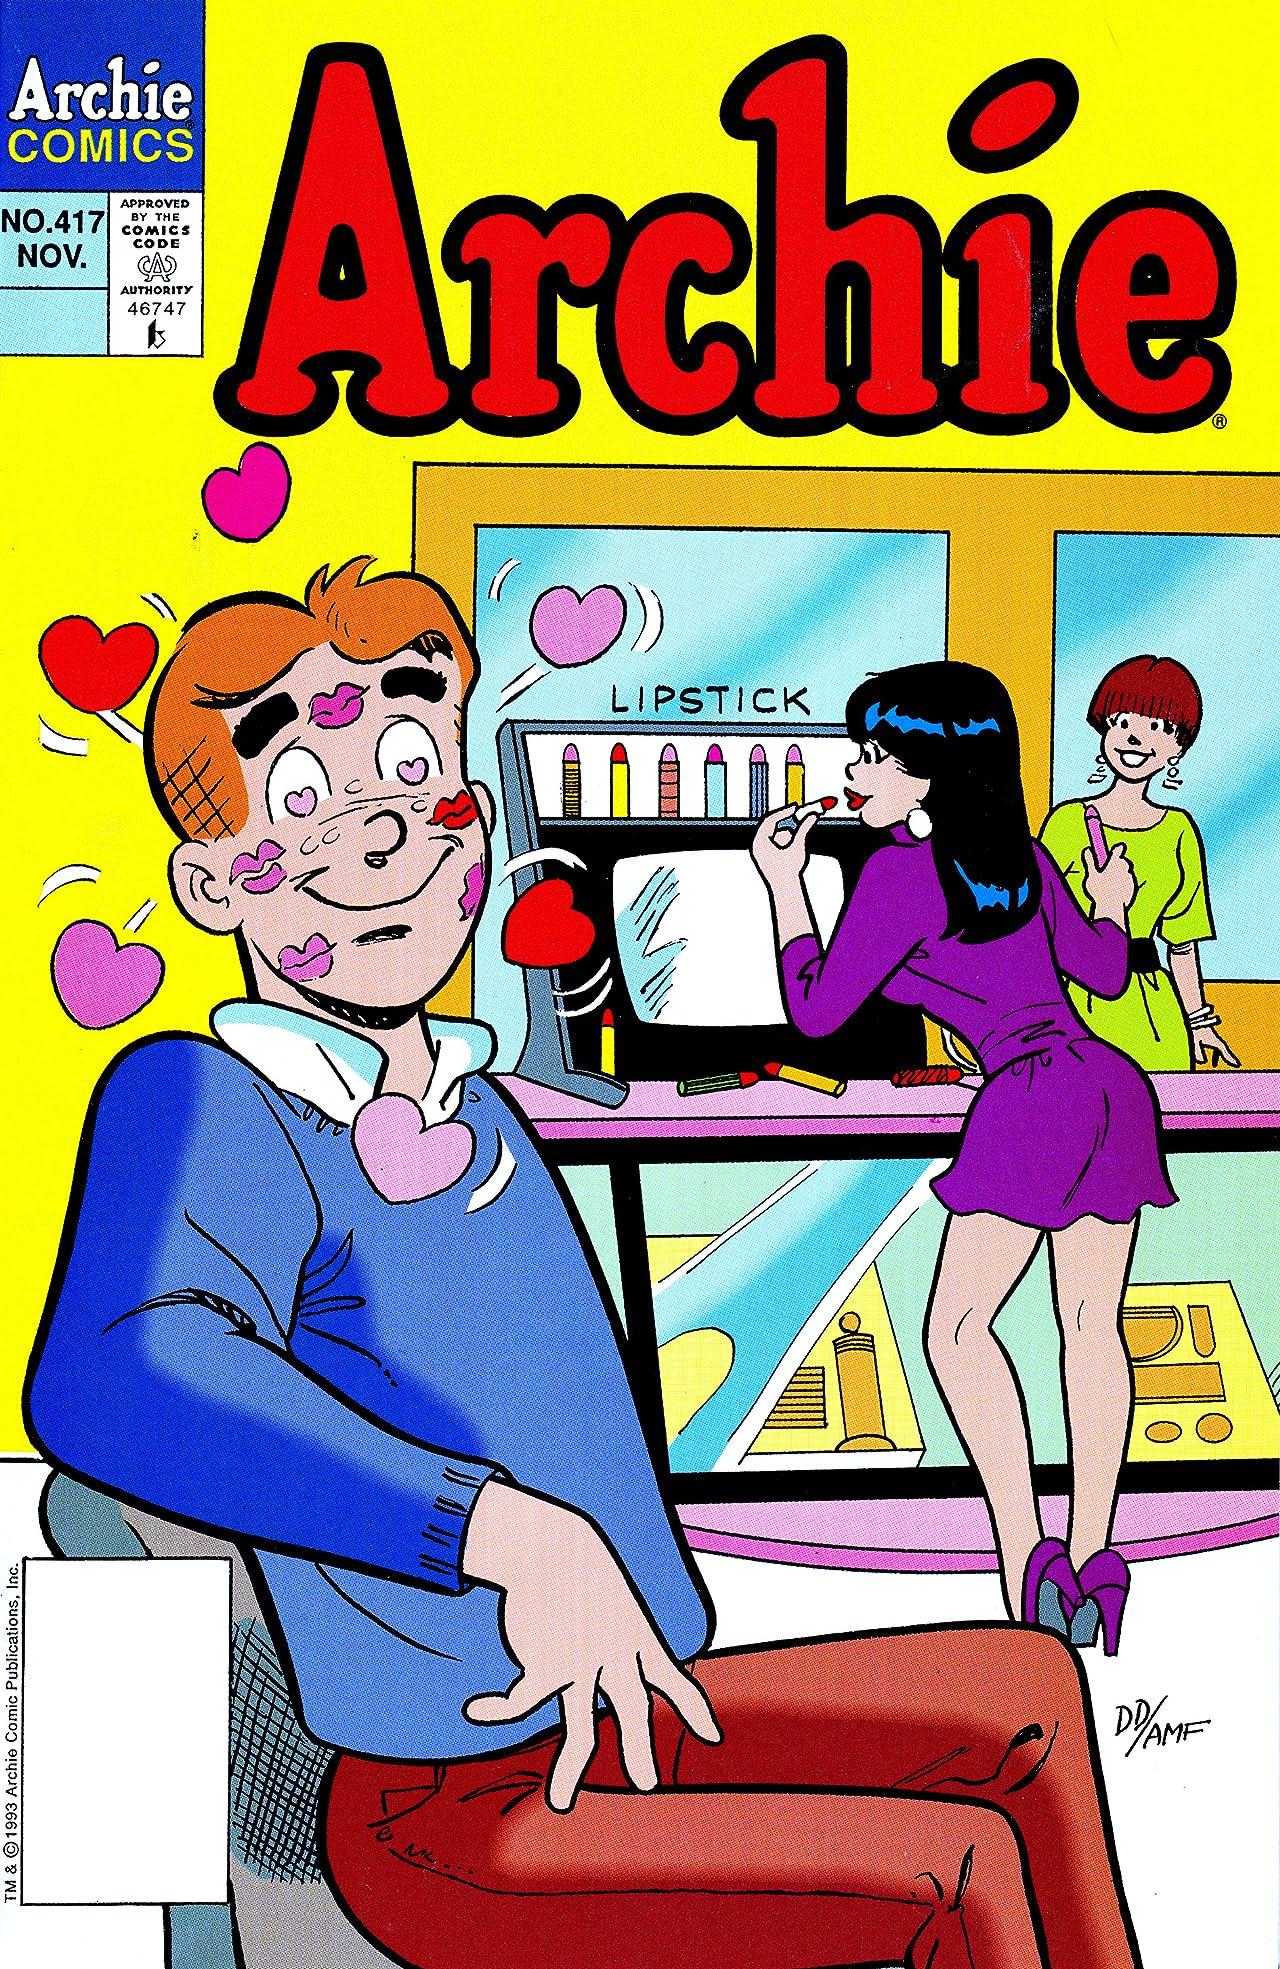 Archie #417